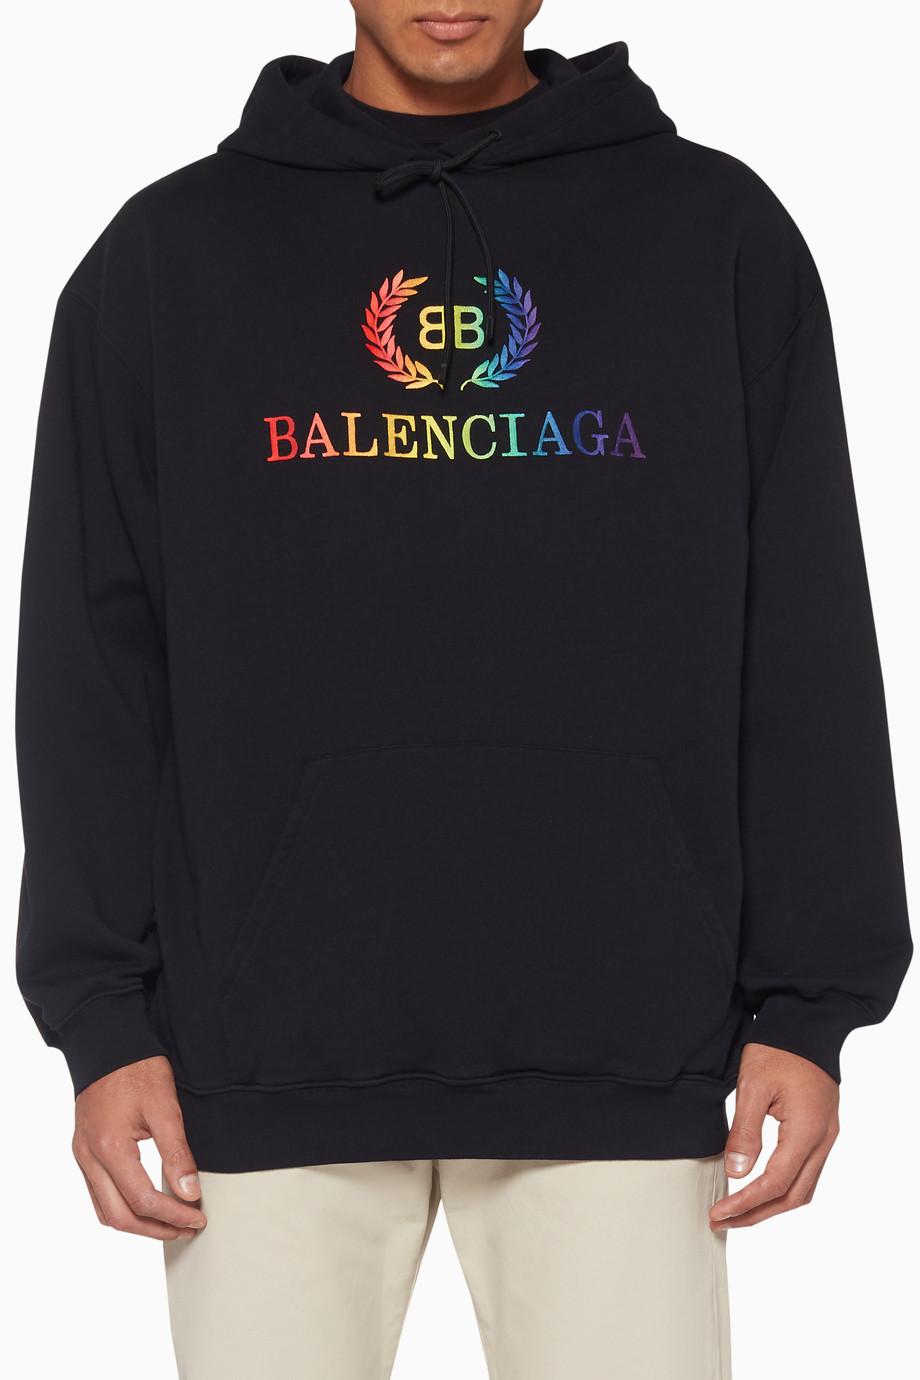 75b8e3446 Shop Balenciaga Black Rainbow Logo Graphic Hoodie for Men   Ounass UAE